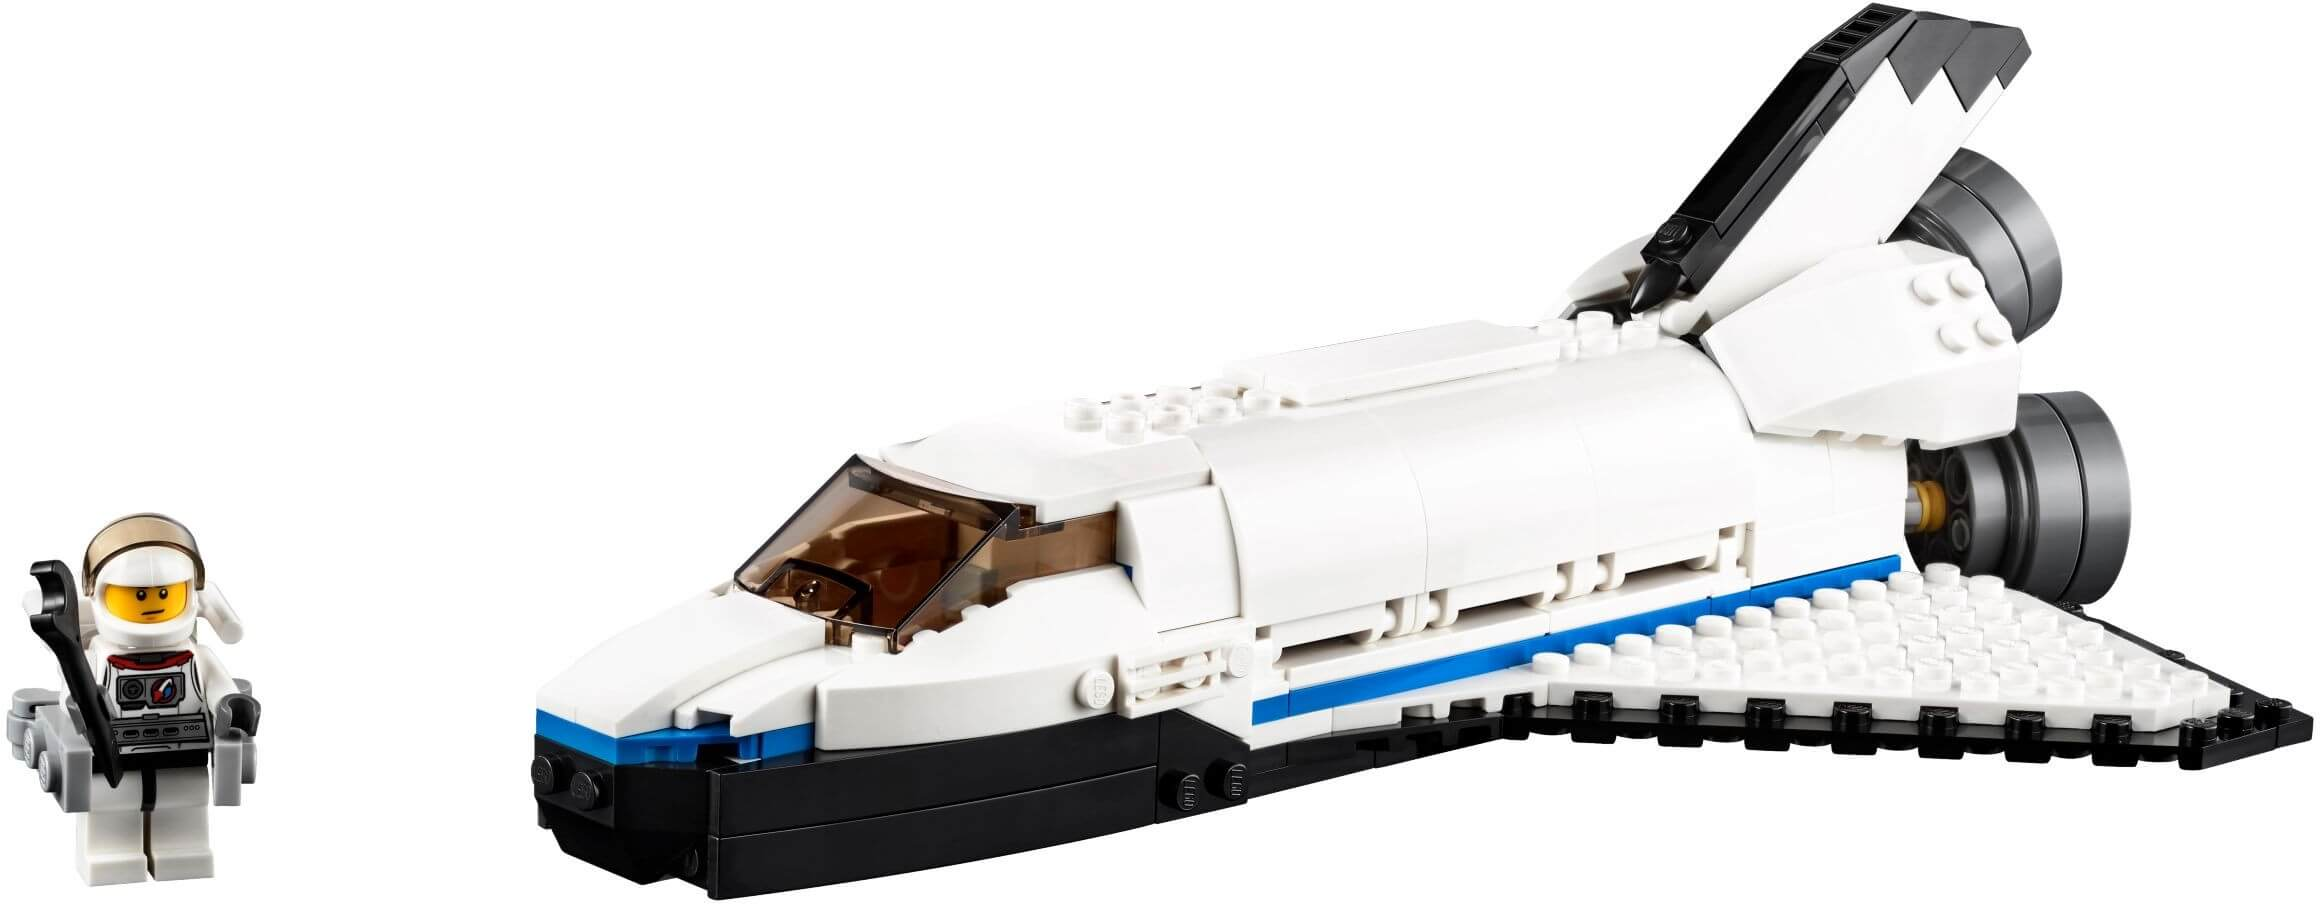 Mua đồ chơi LEGO 31066 - LEGO Creator 31066 - Tàu Con Thoi thám hiểm Vũ Trụ 3-trong-1 (LEGO Creator Space Shuttle Explorer)